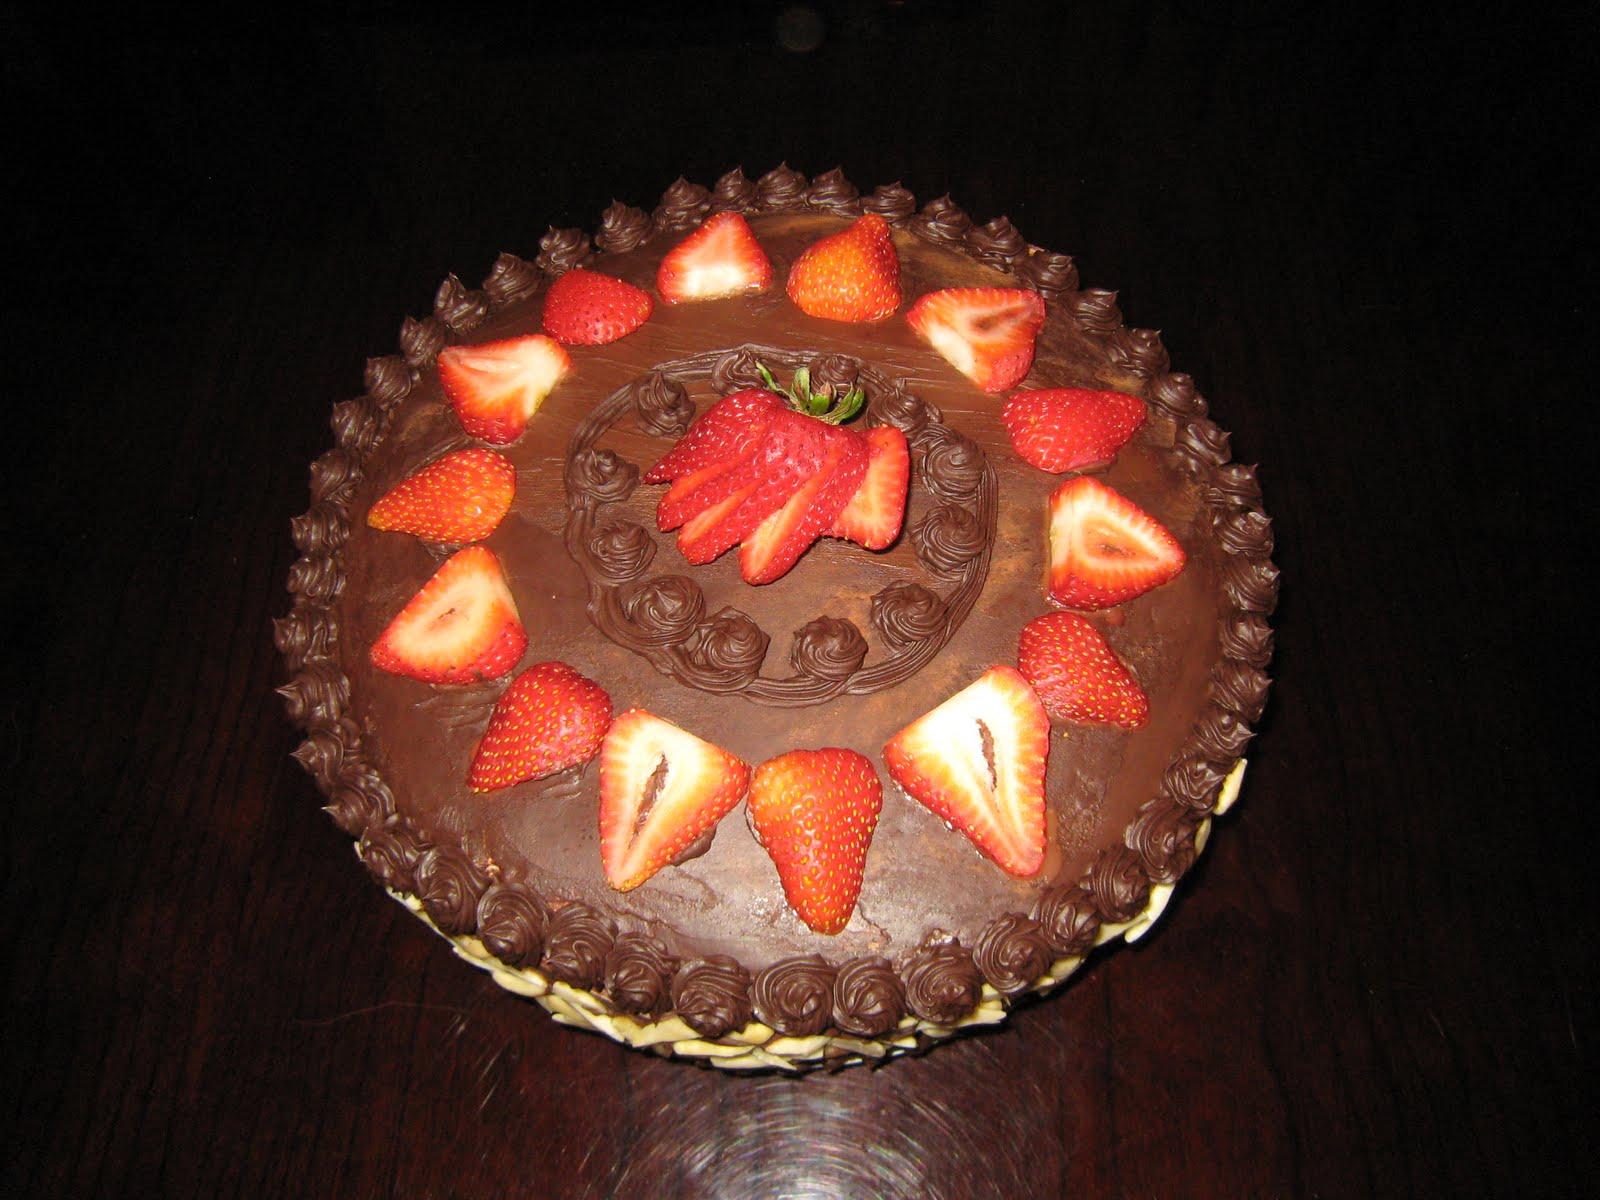 The Baking Network Birthday Cake 2010